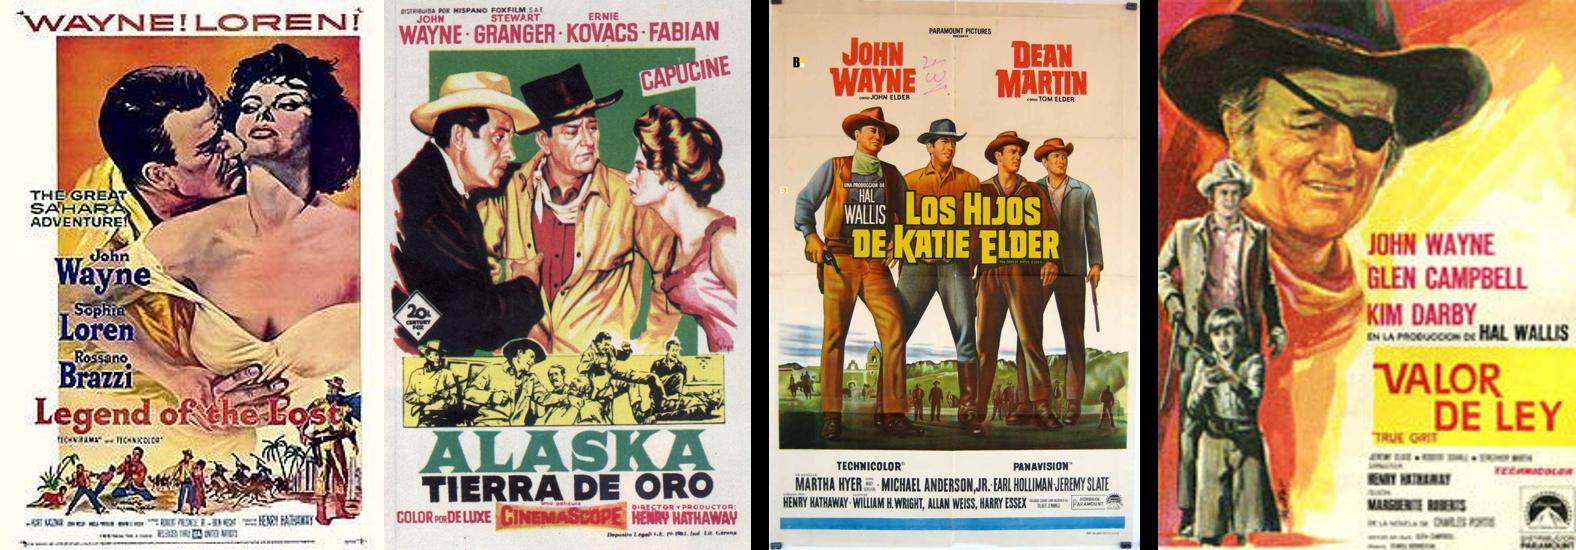 John Wayne afiches 3